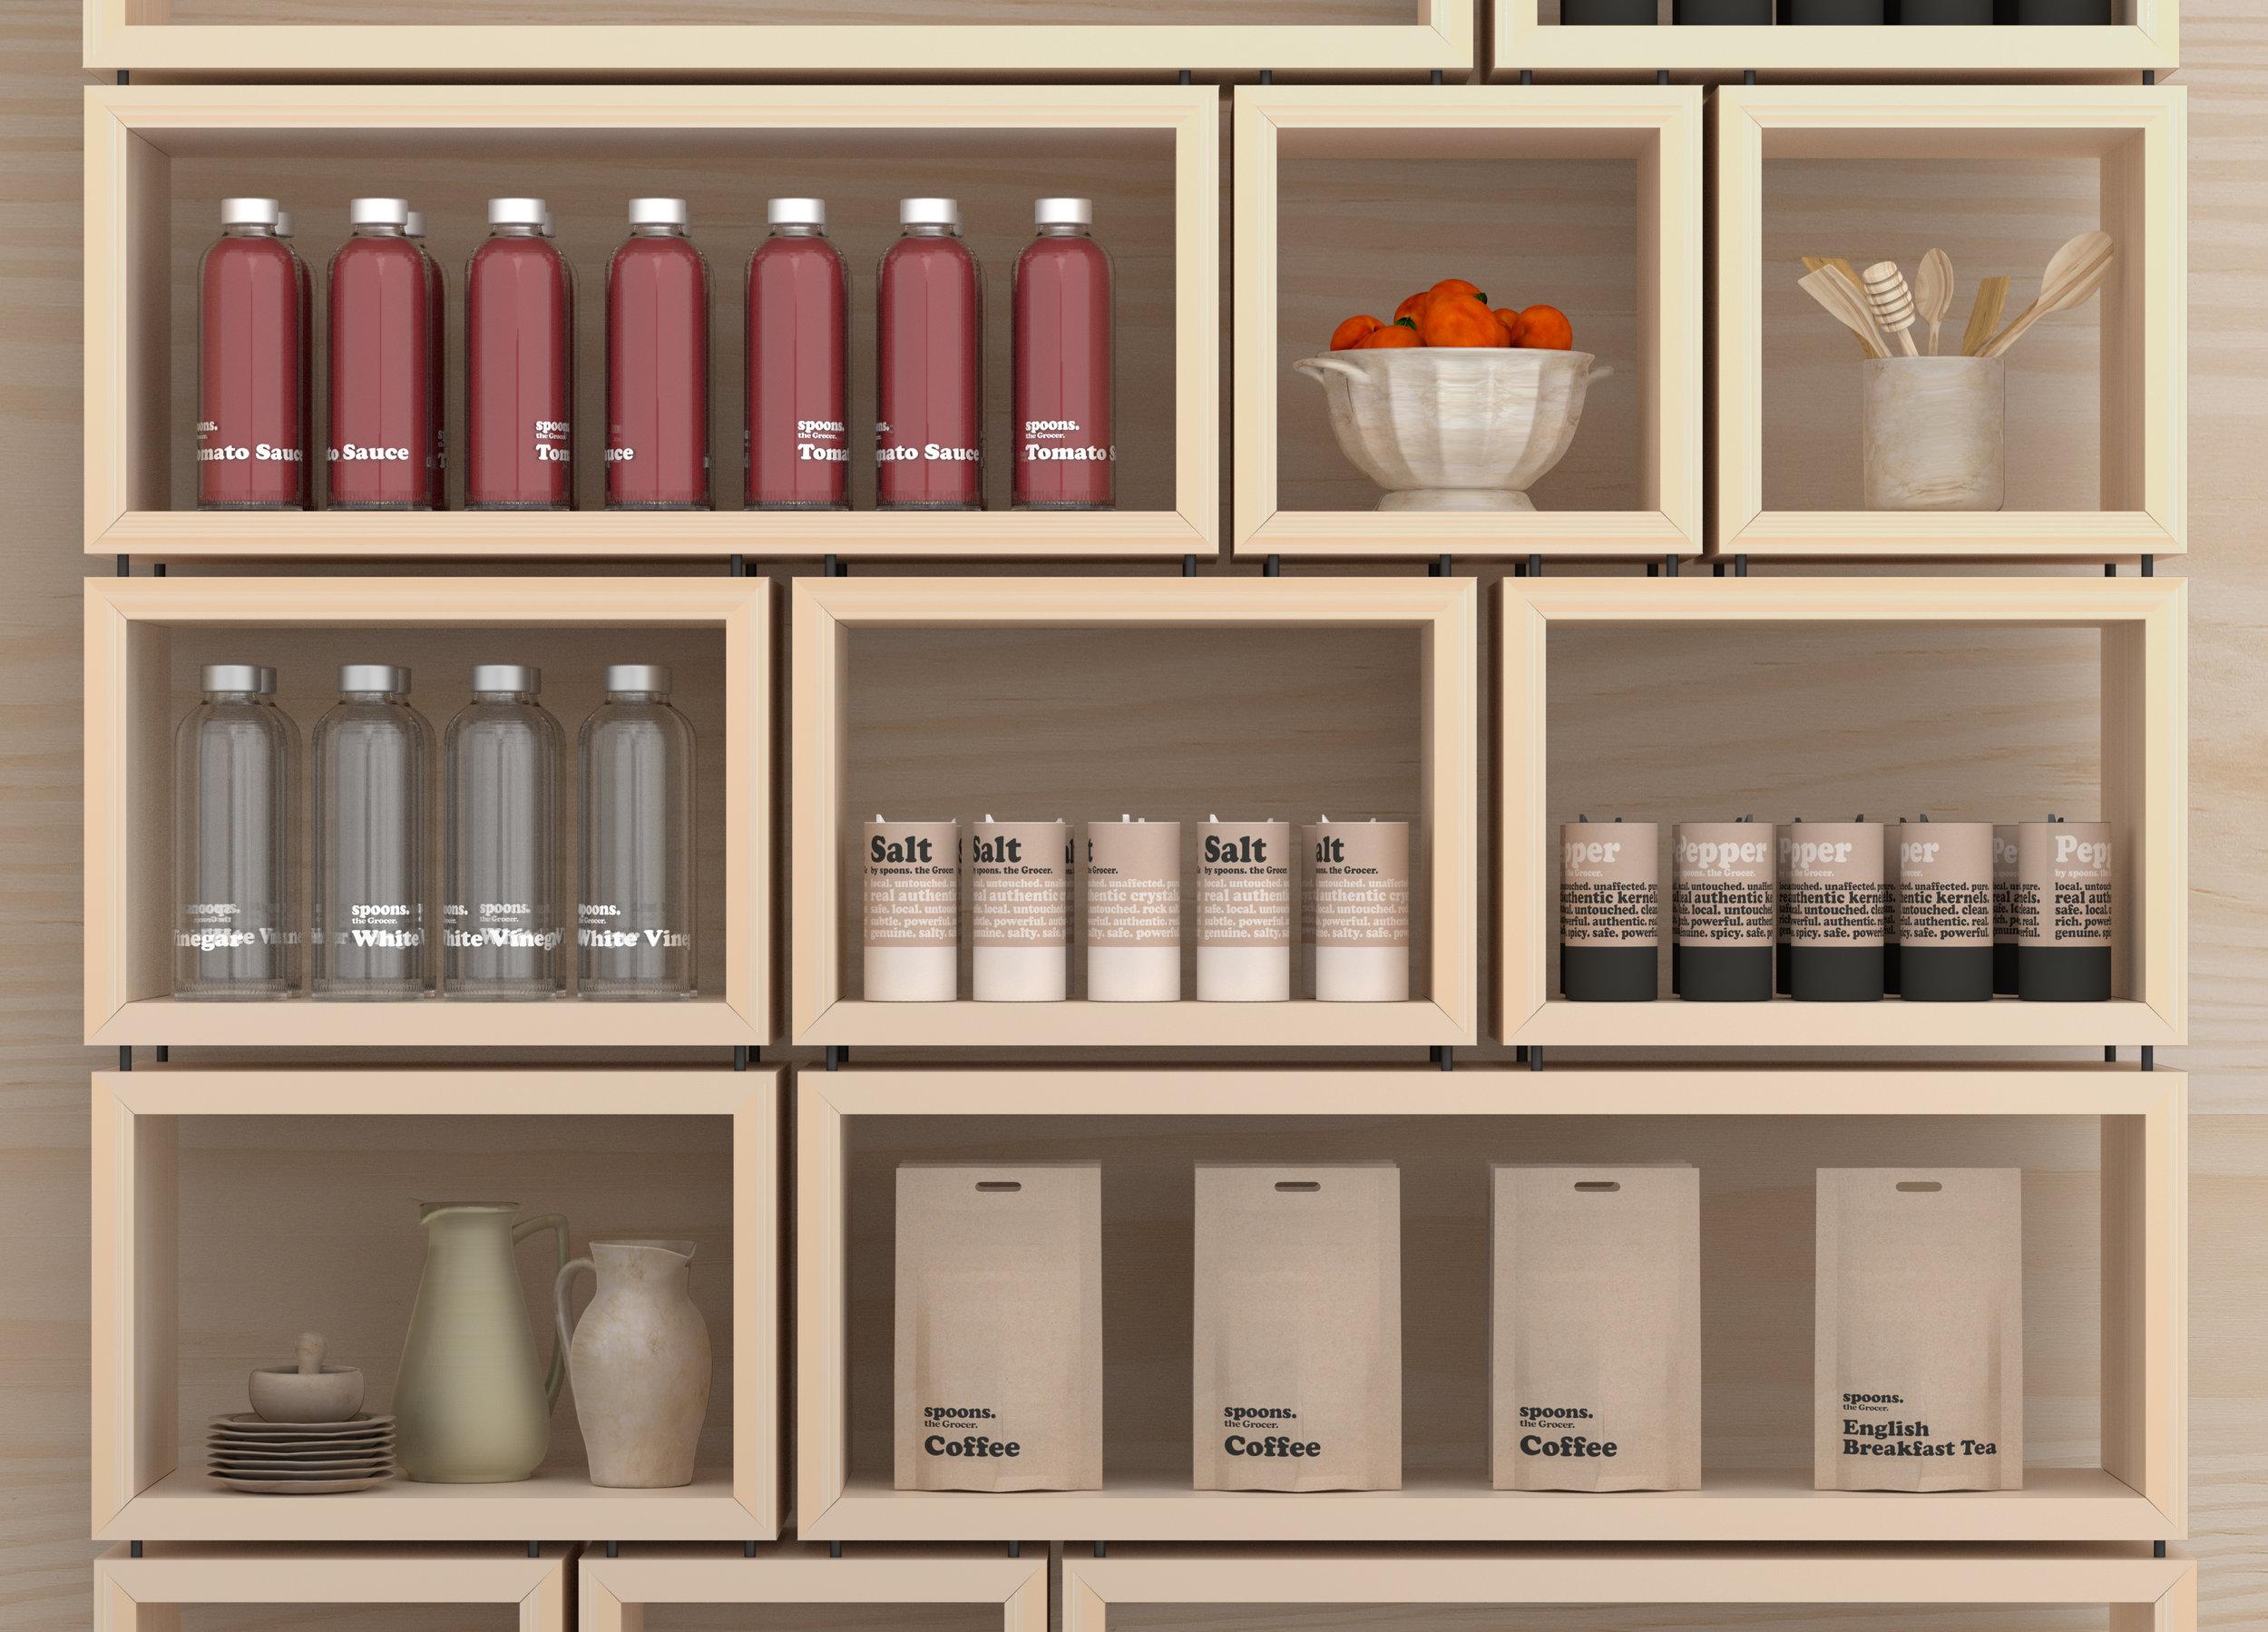 spoons-the-grocer-shop-shelf-mockup-sam-blomley-branding-1